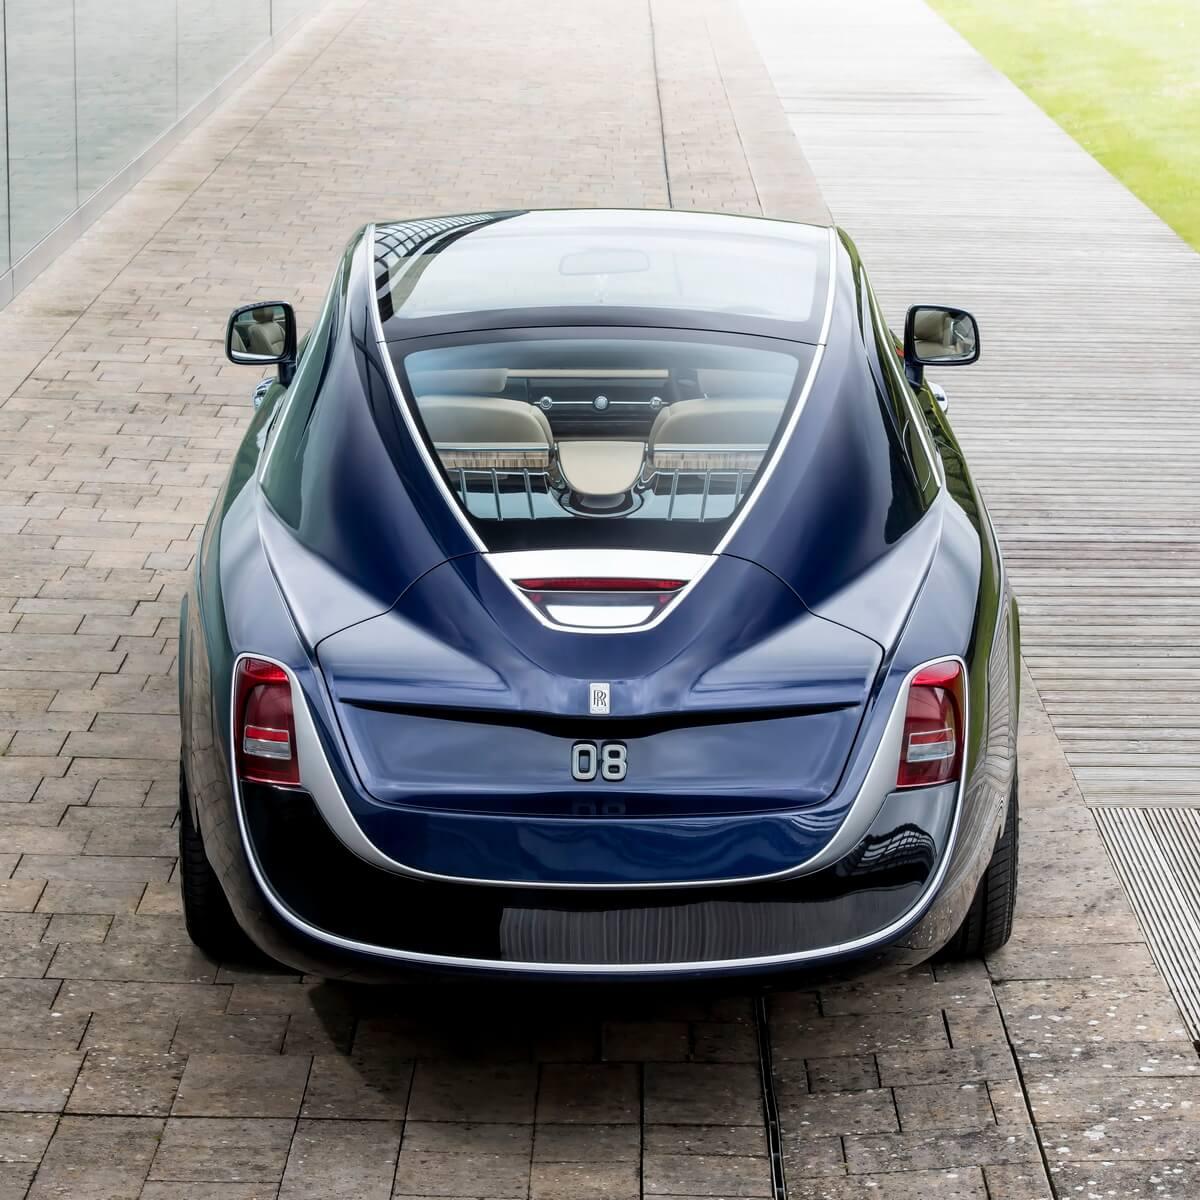 2017 Rolls Royce Camshaft – name